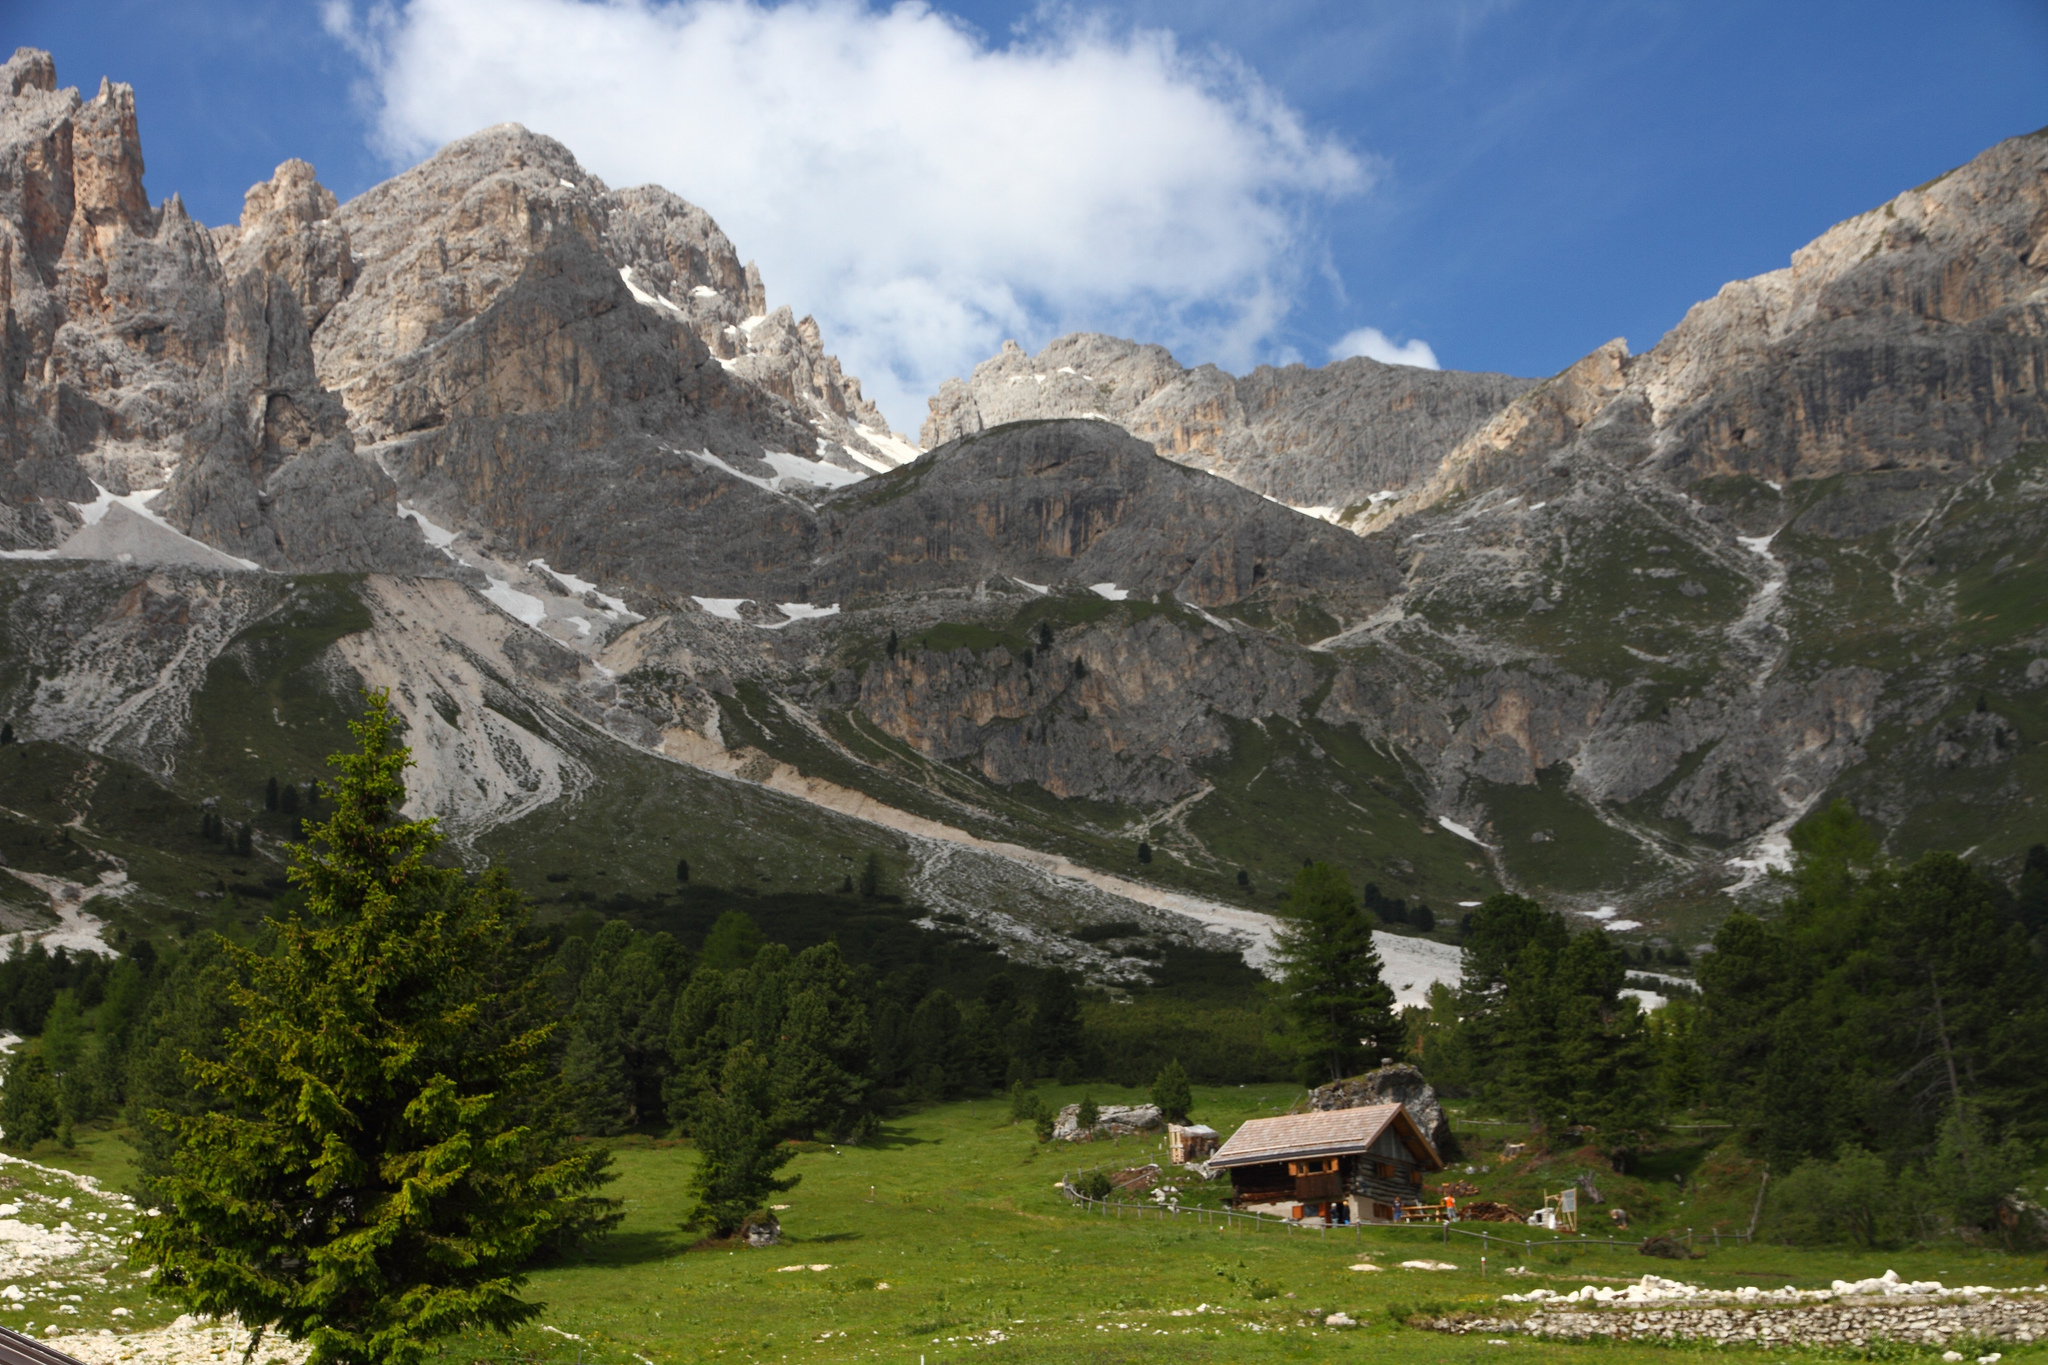 Sud Tirolo e i suoi Passi